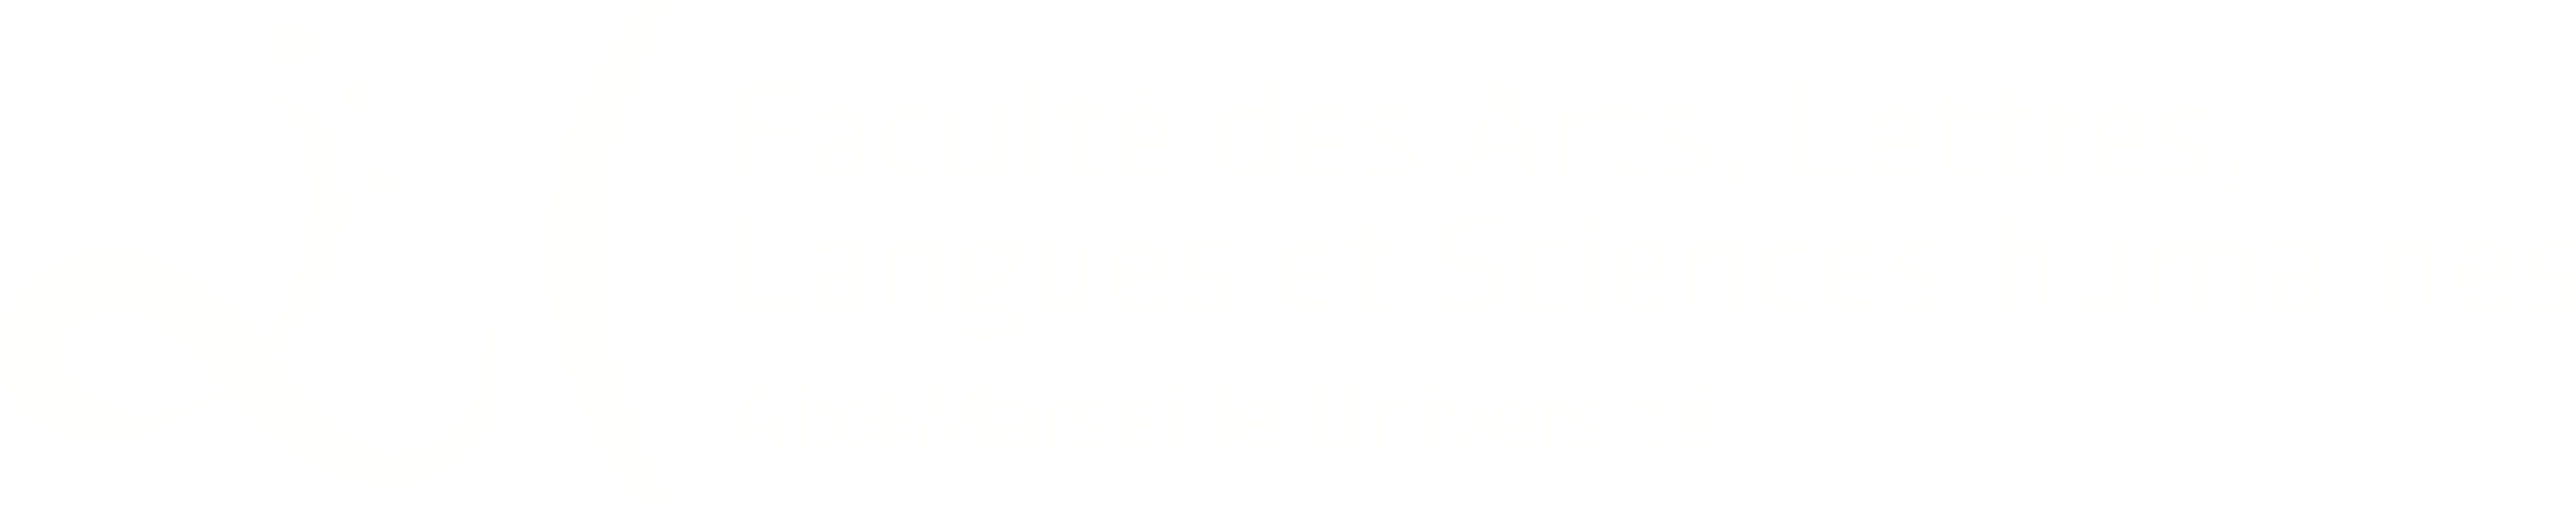 Faculte Aix Marseille blanc